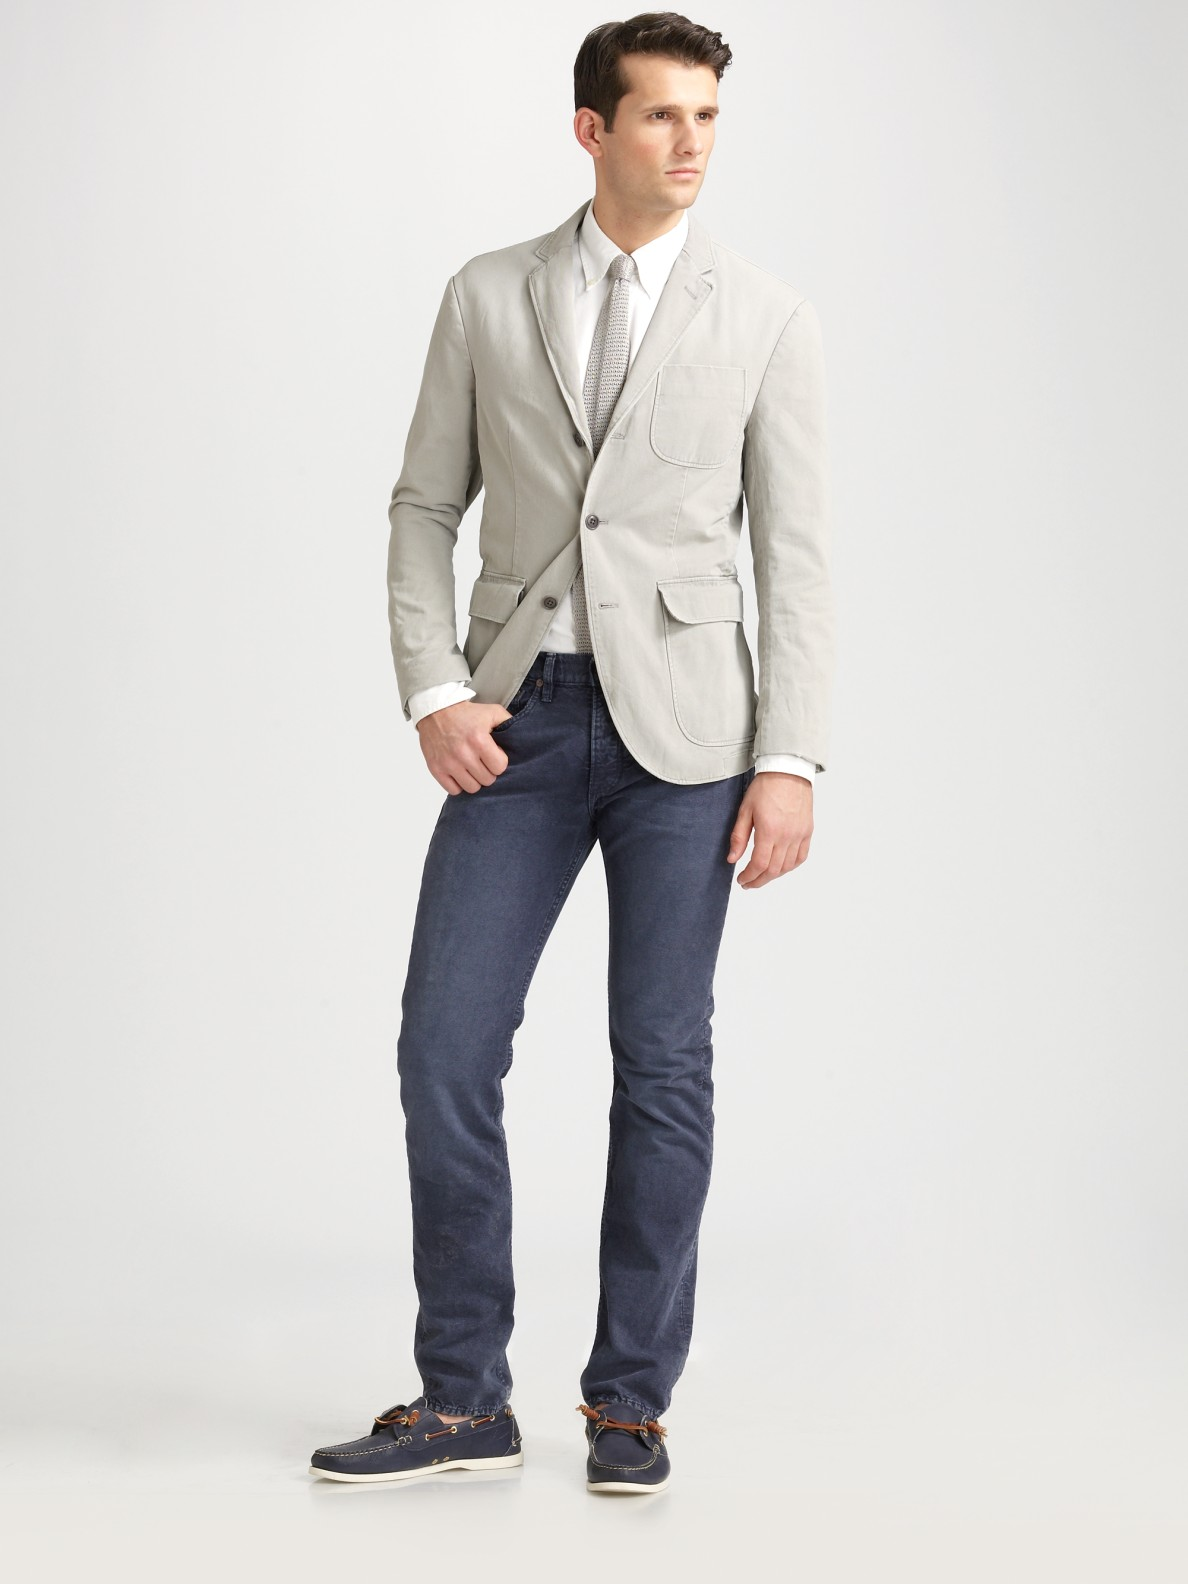 polo ralph lauren slim fit jeans in blue for men navy lyst. Black Bedroom Furniture Sets. Home Design Ideas